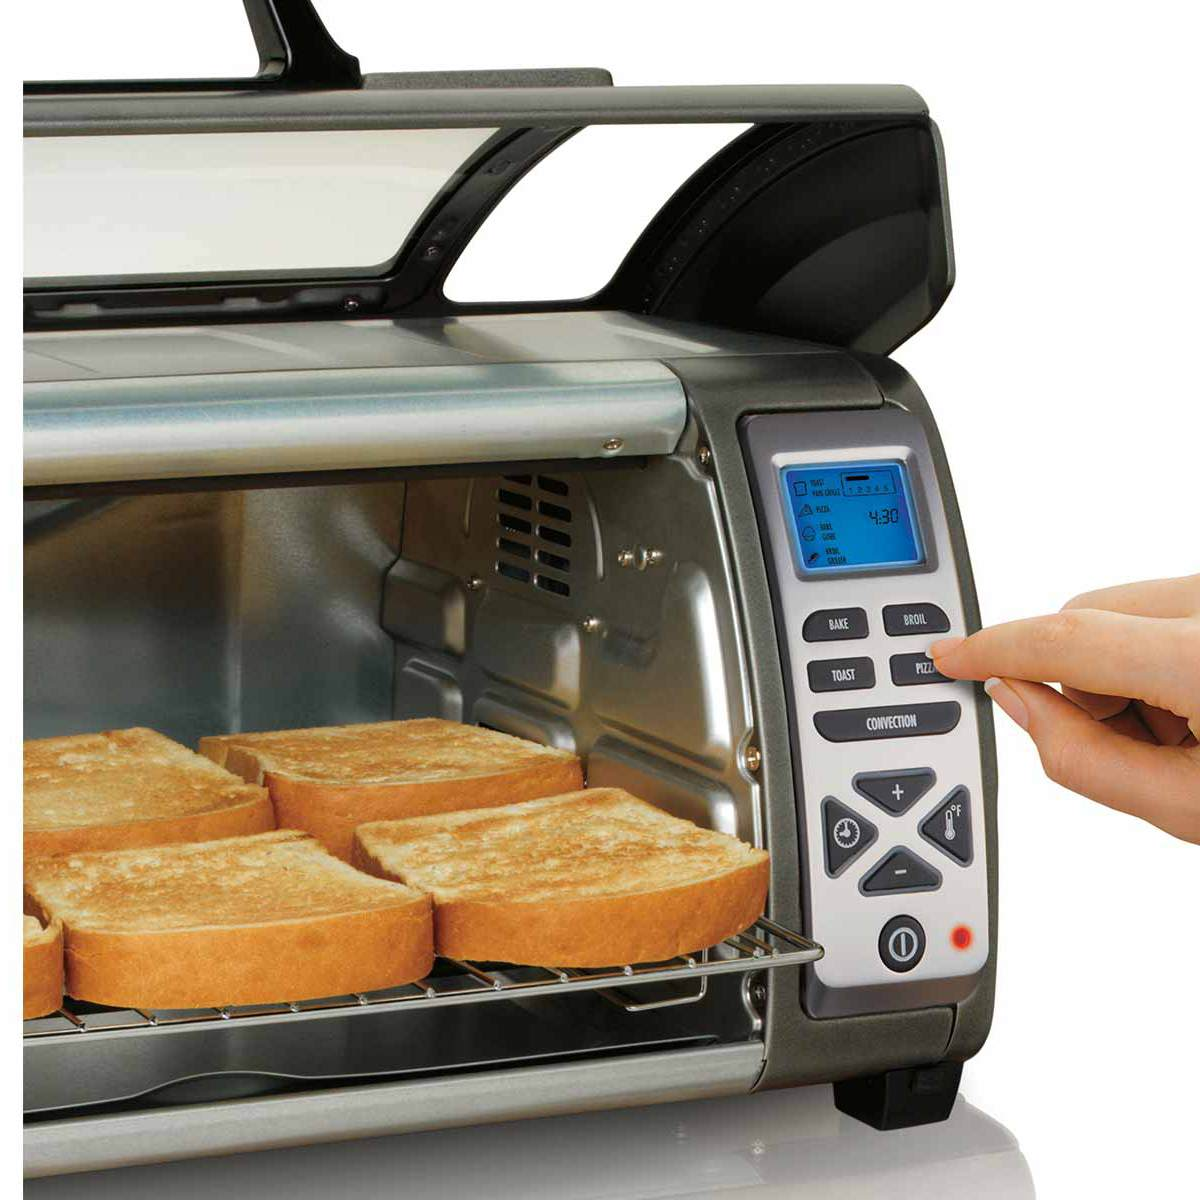 Hamilton Beach 6-Slice Easy Reach® Toaster Oven - 31128